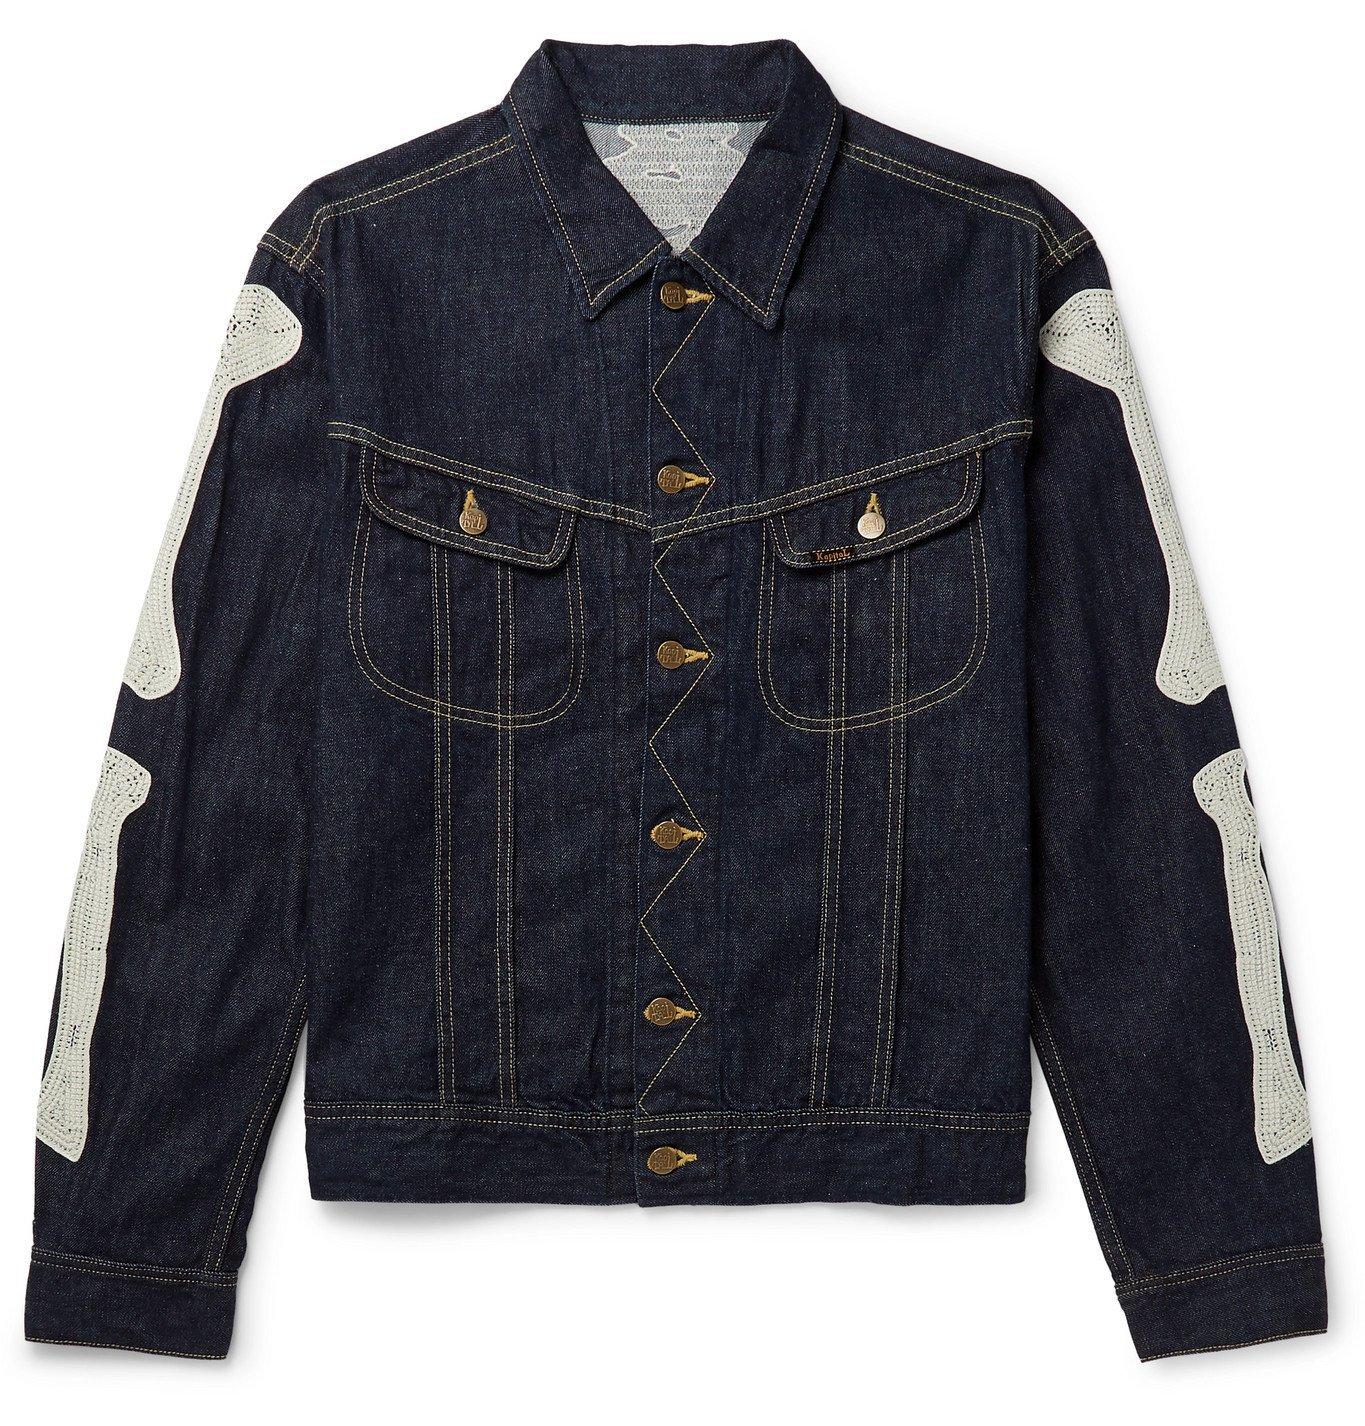 KAPITAL - Appliquéd Denim Jacket - Blue